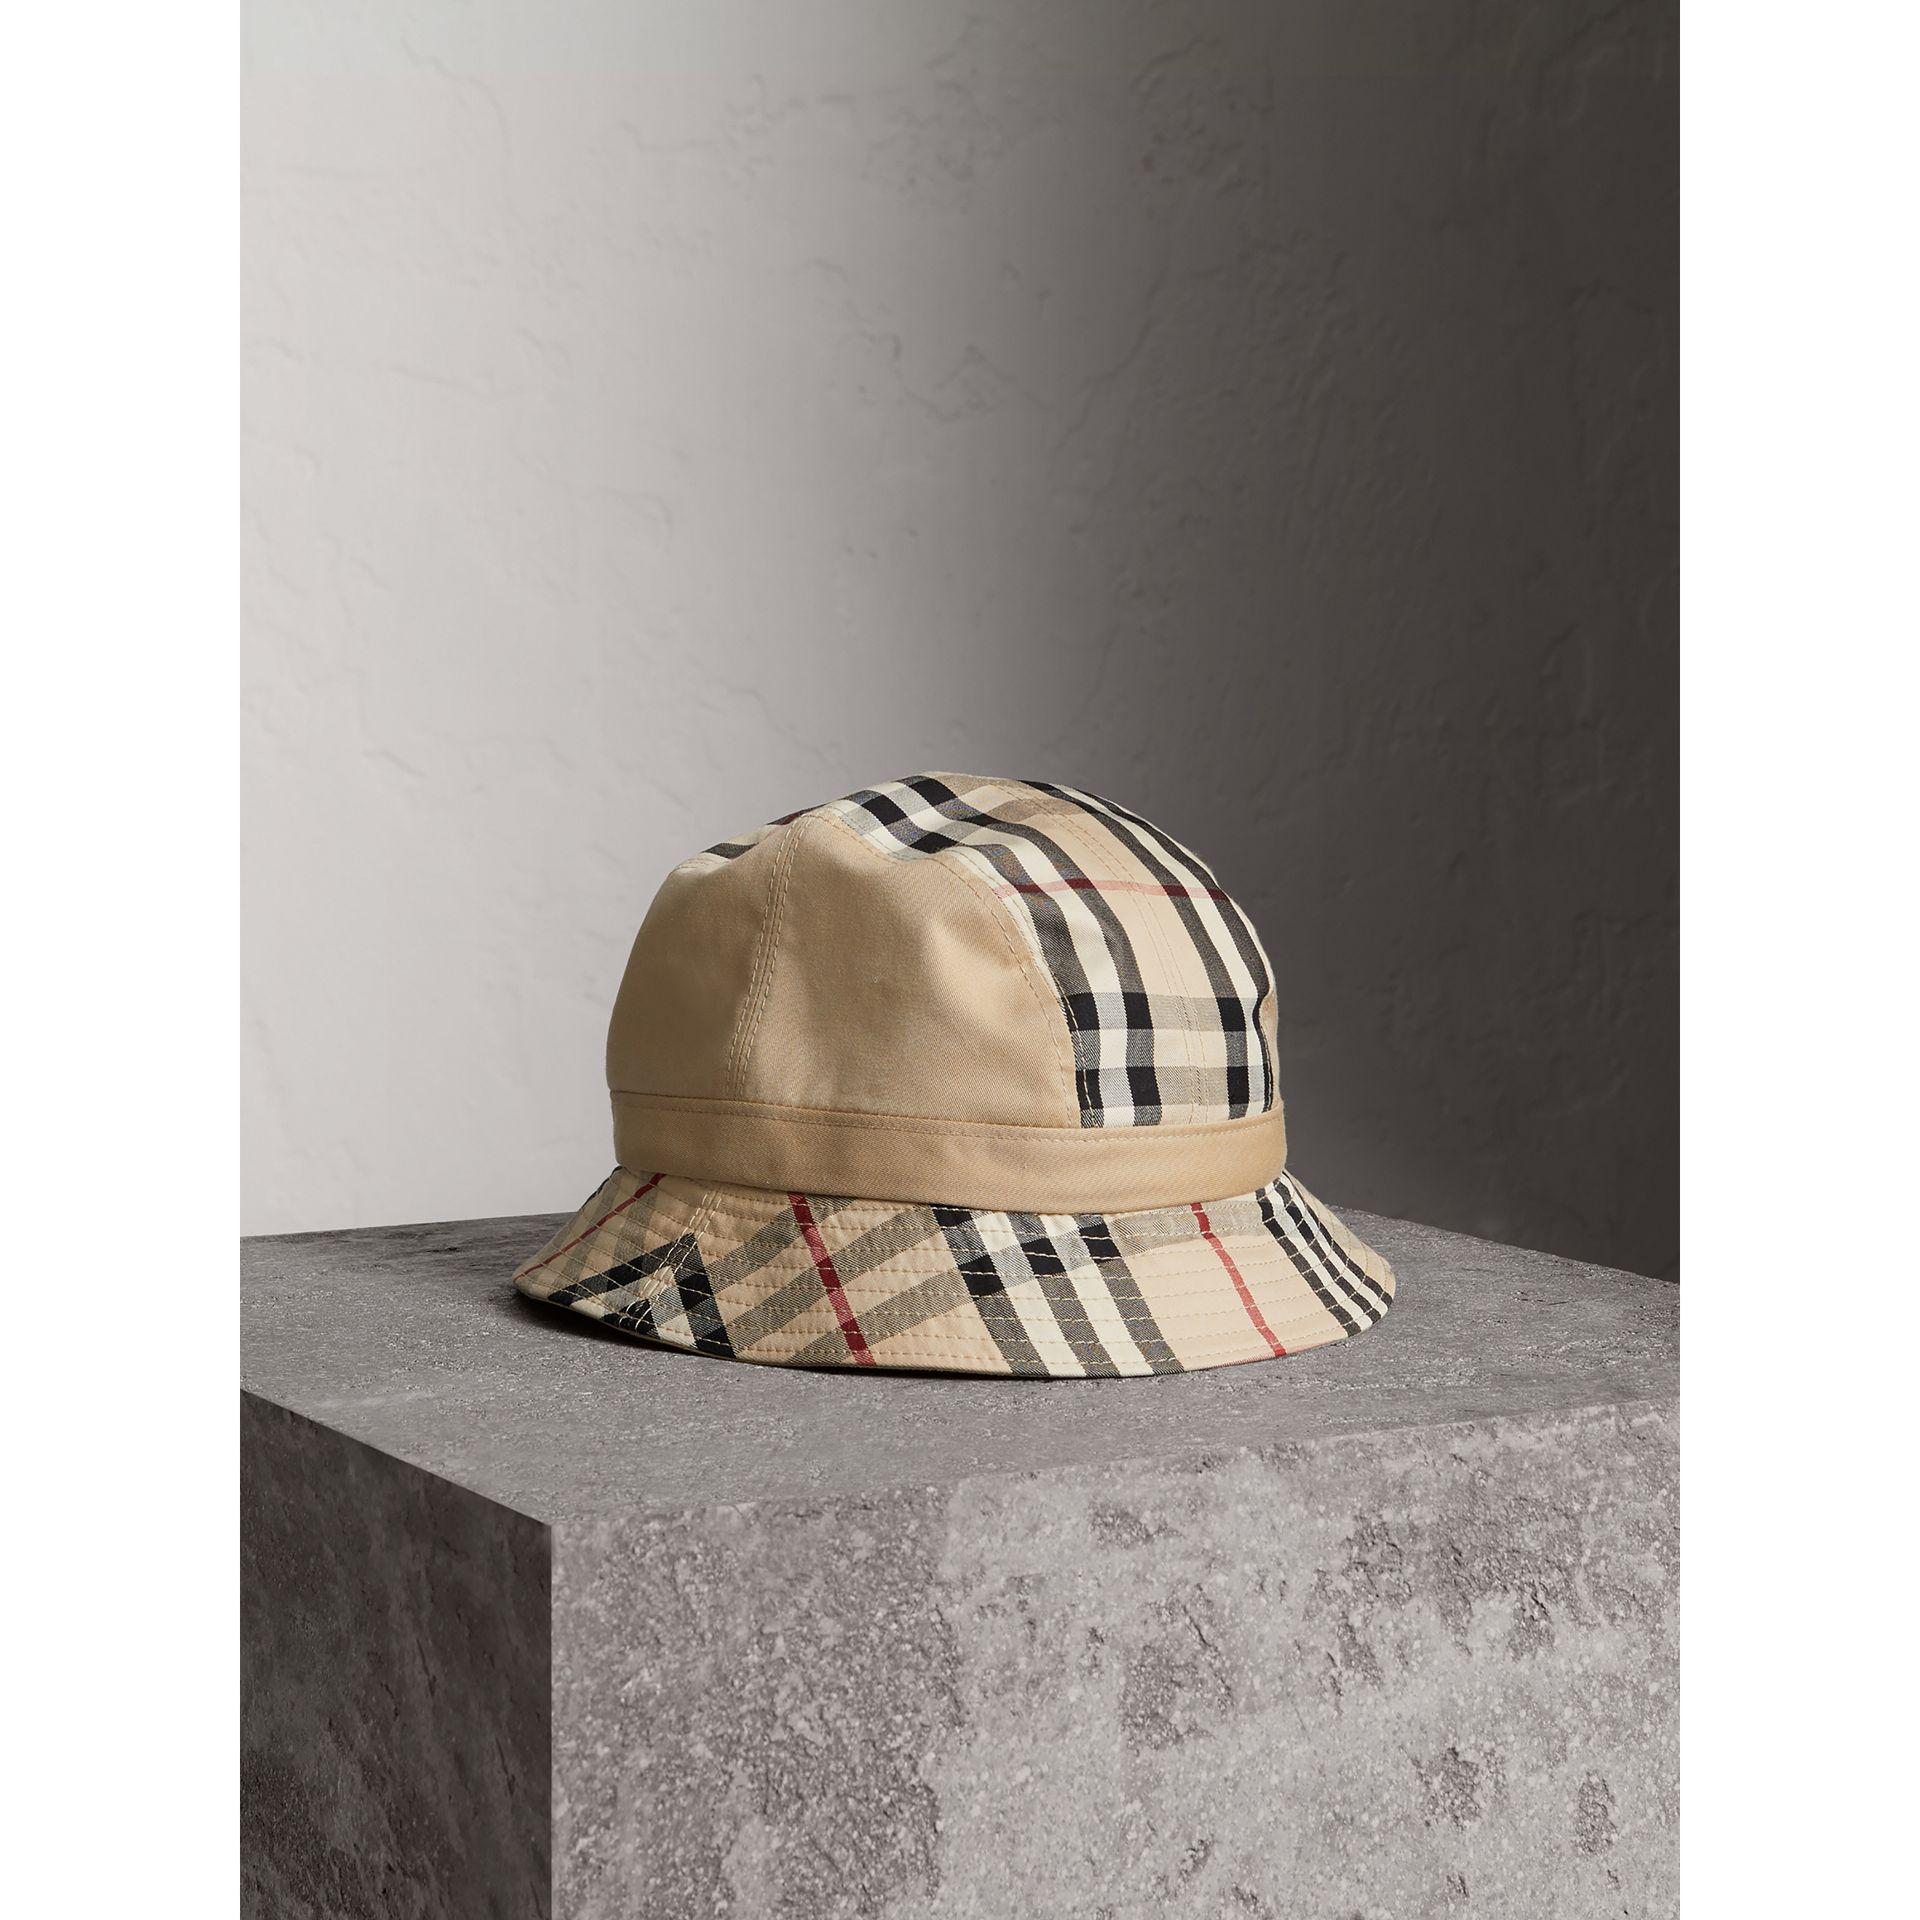 Lyst - Burberry Gosha X Bucket Hat for Men 1b4c6bfb624